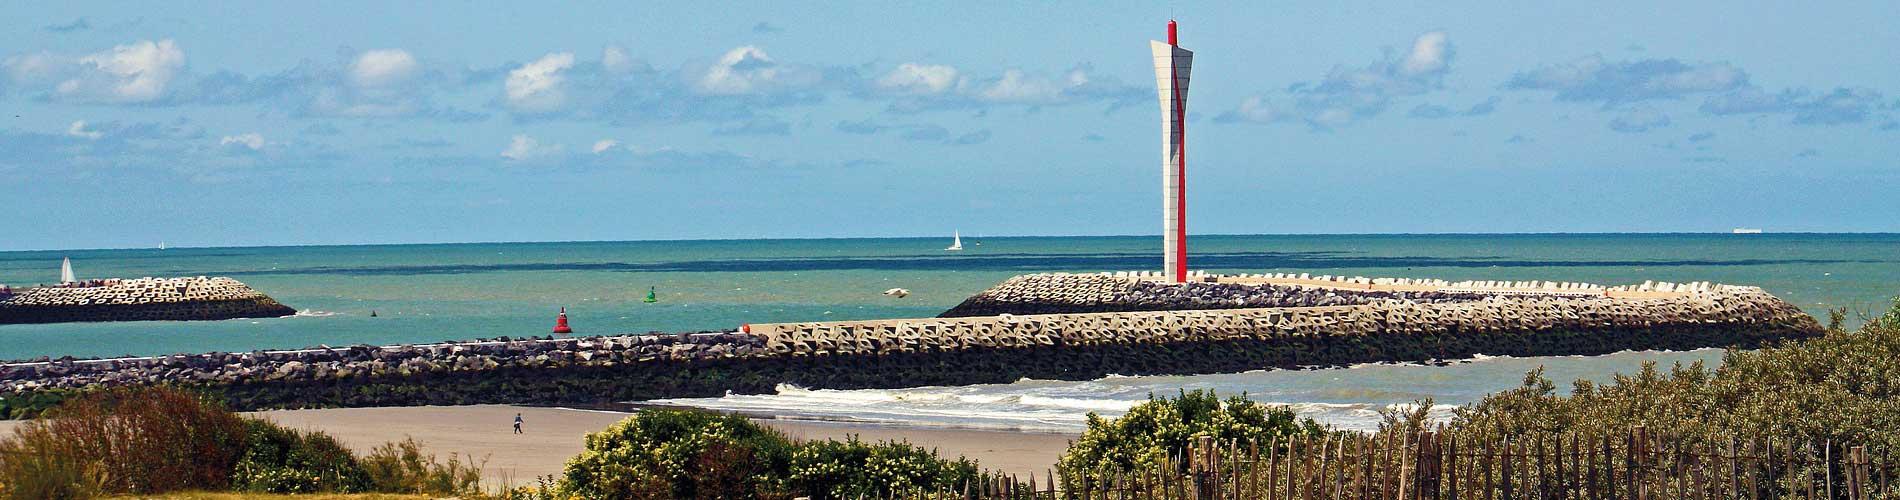 Blog_BelgianBreaks2020_Ostend_Beach_1900x500_Q120